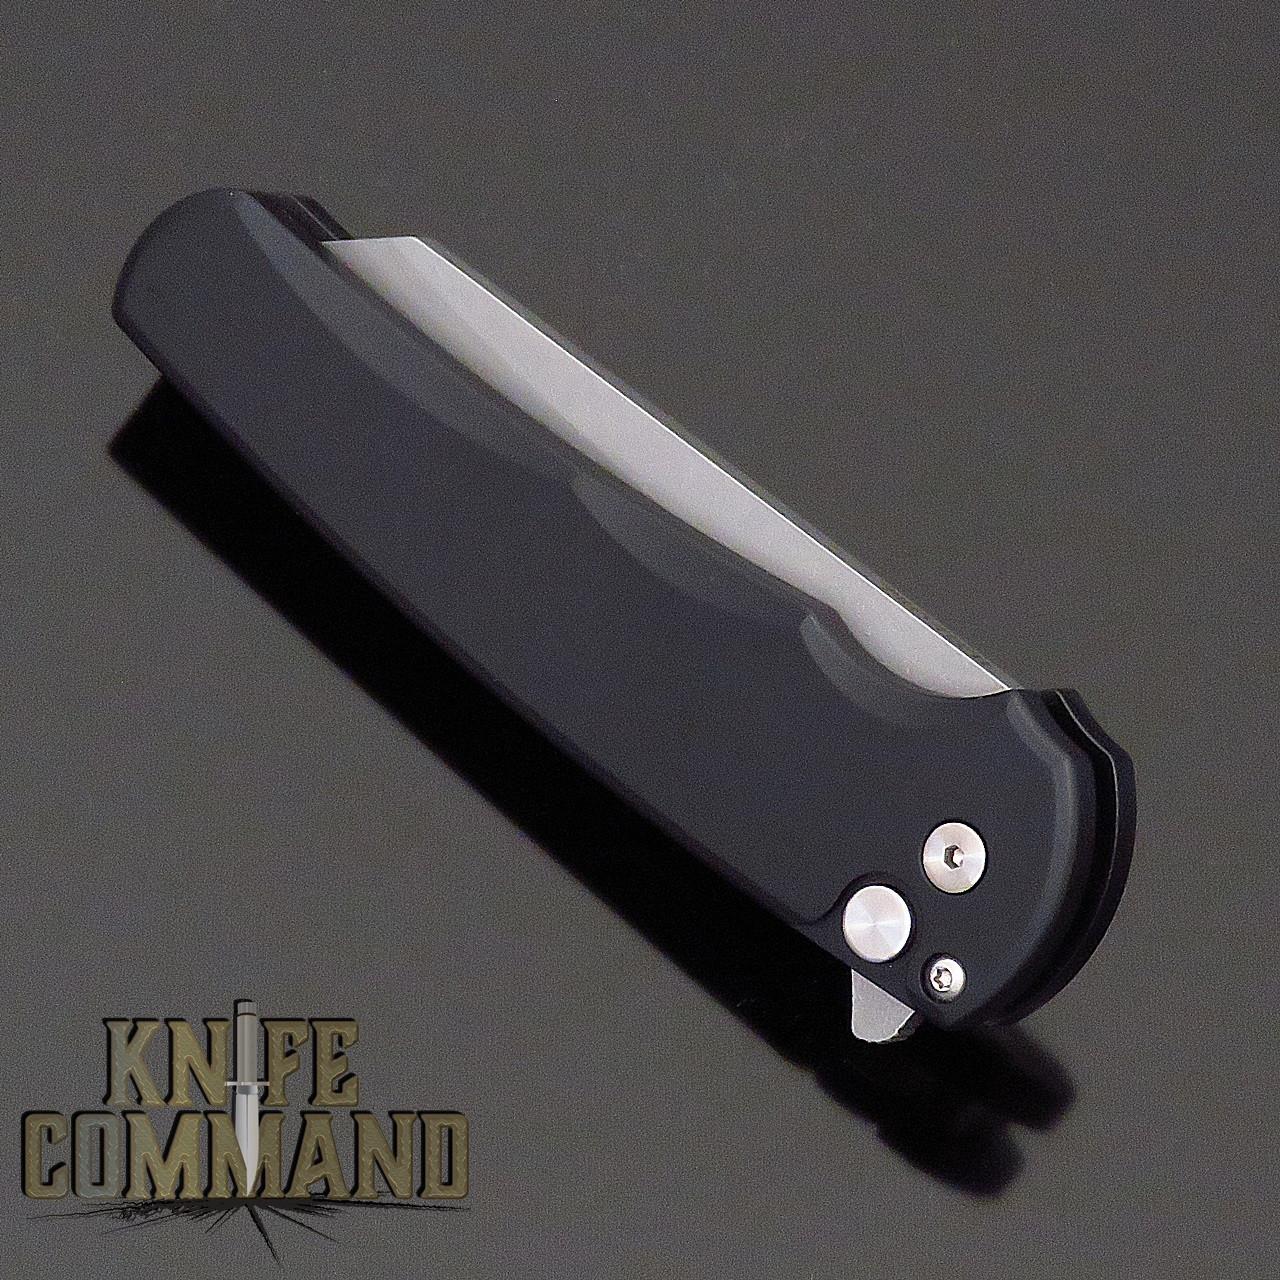 "Pro-Tech Knives 5201 Malibu Manual Flipper Knife Folder 3.25"" Stonewash CPM-20CV Reverse Tanto Blade"